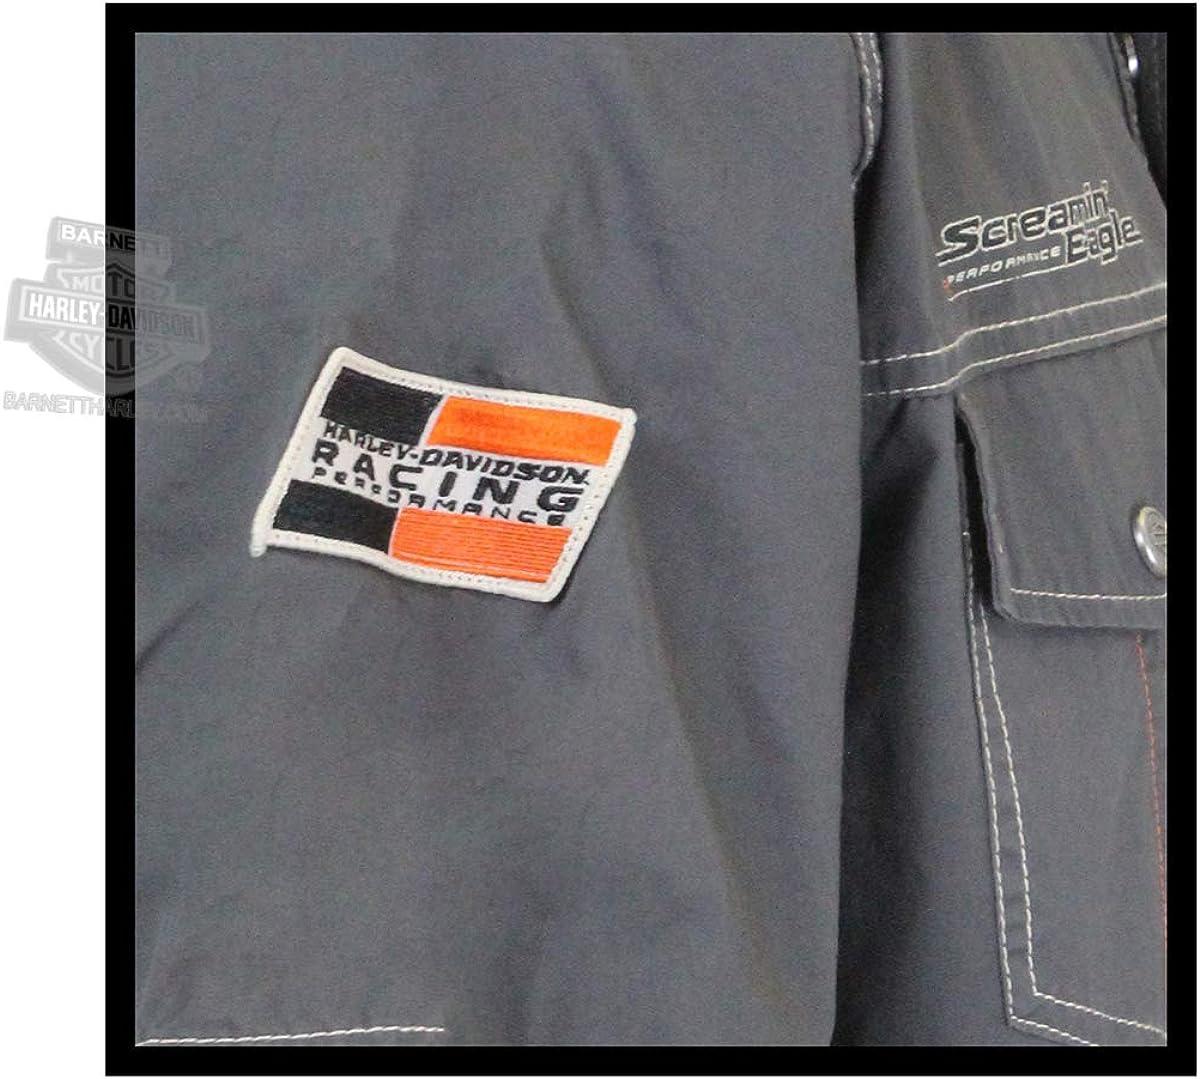 NIKE AIR JORDAN Boys Sweatpants ThermaFit Pants Black Camo 951381 NWT $55 LARGE